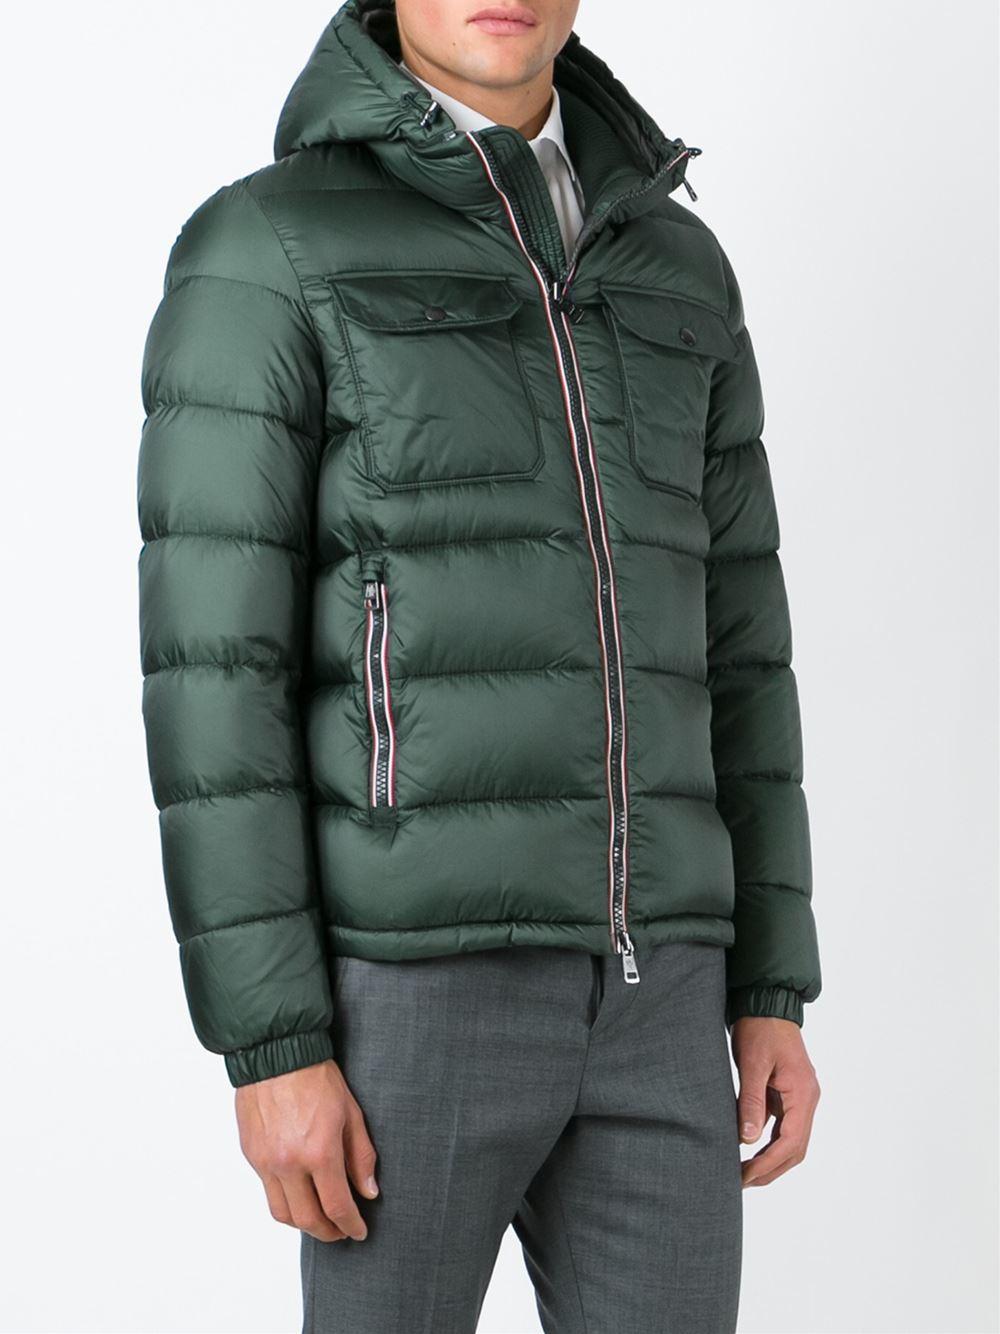 moncler jeanbart glossy puffer jacket; lyst moncler demar padded jacket in green for men